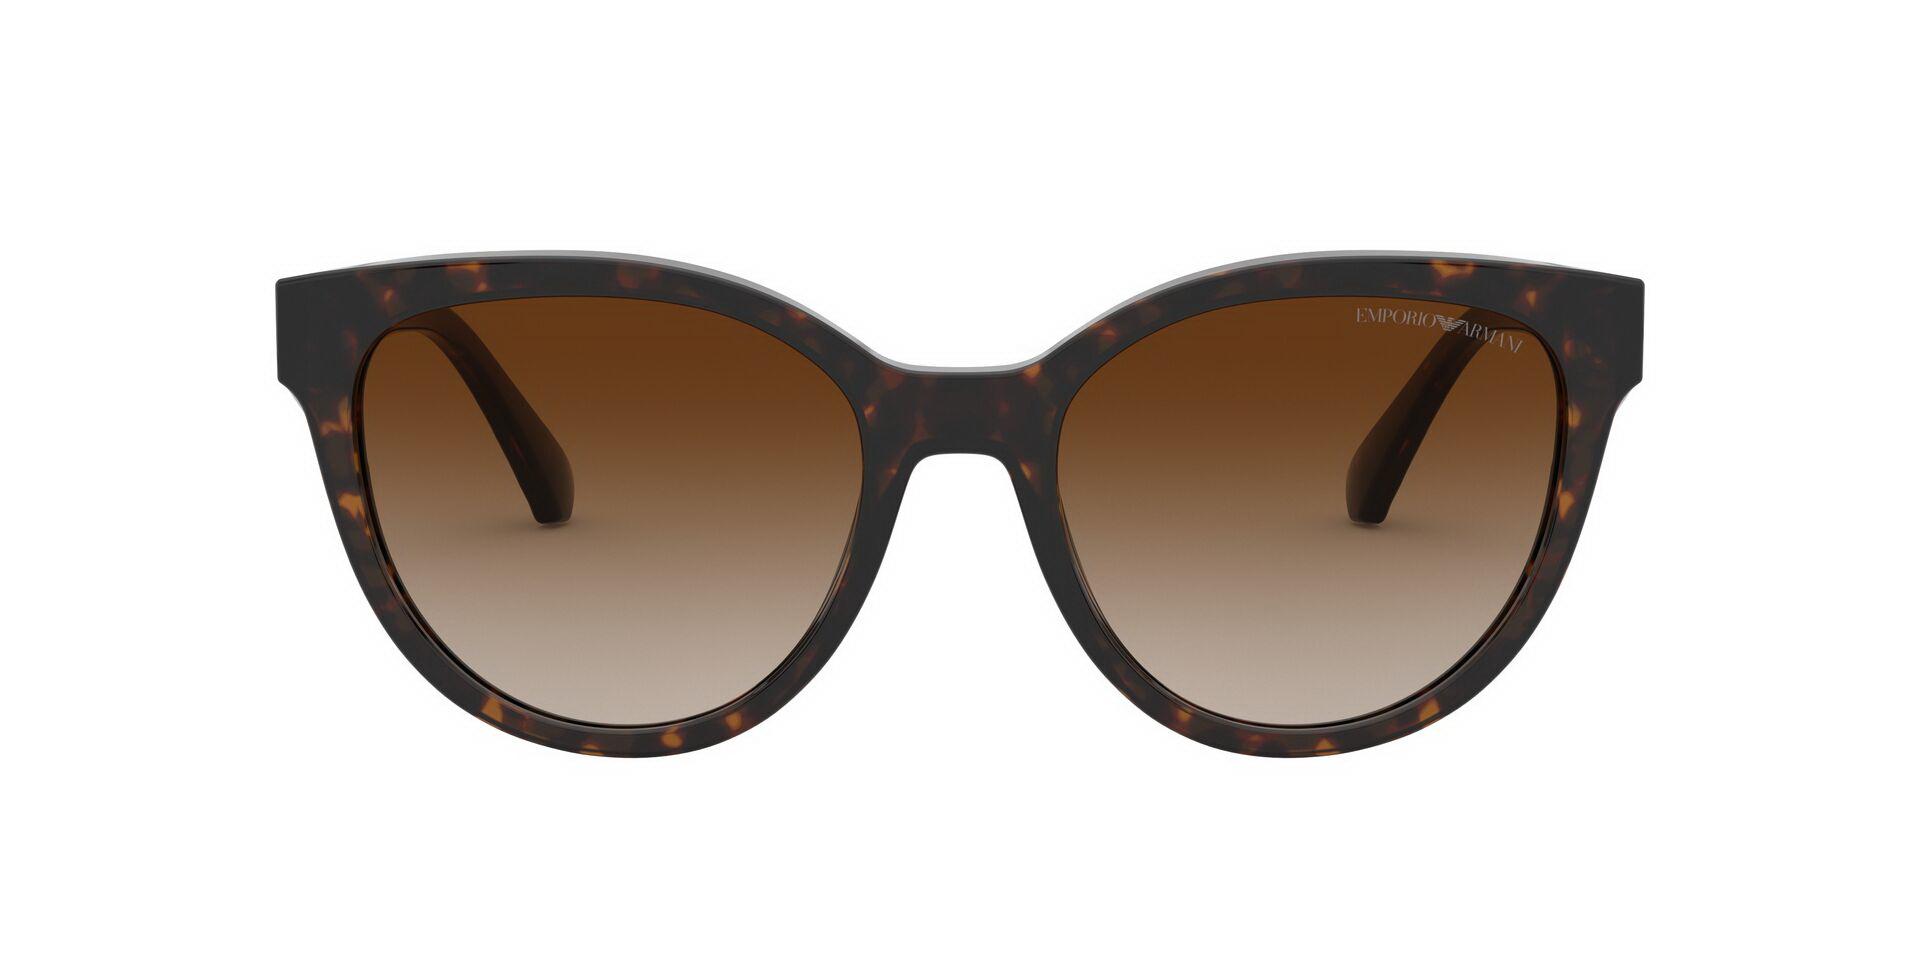 Солнцезащитные очки Очки с/з Emporio Armani 0EA4140 508913 фото